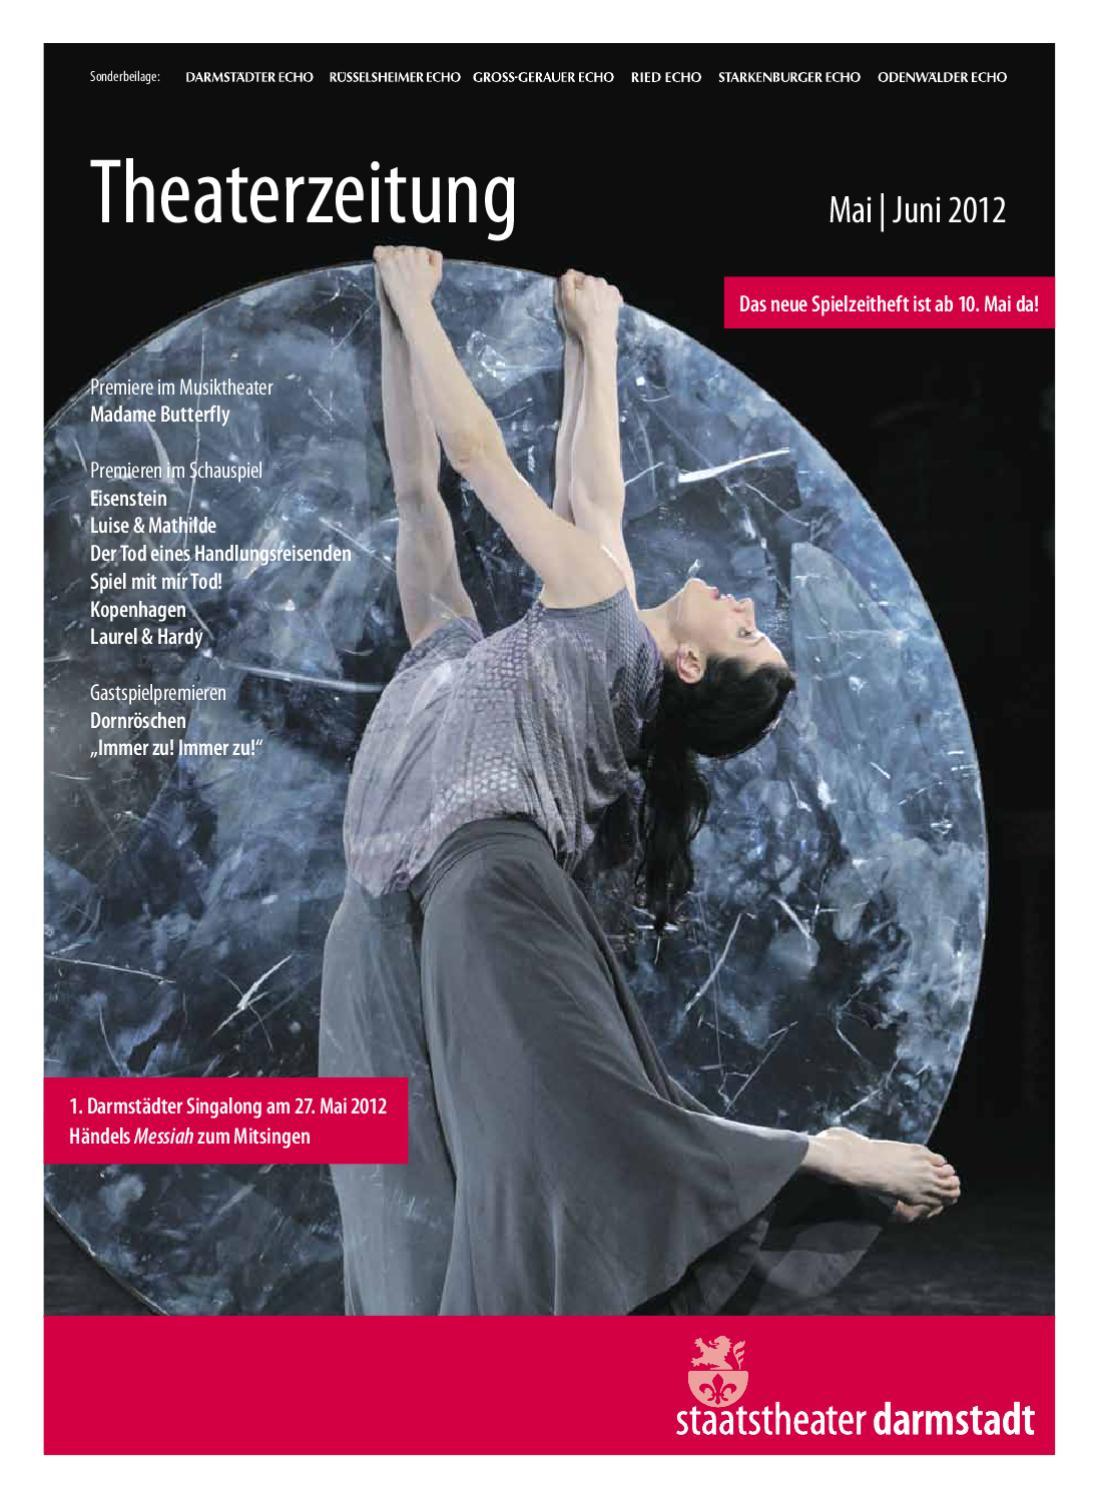 Theaterzeitung Mai | Juni 2012 by Staatstheater Darmstadt - issuu